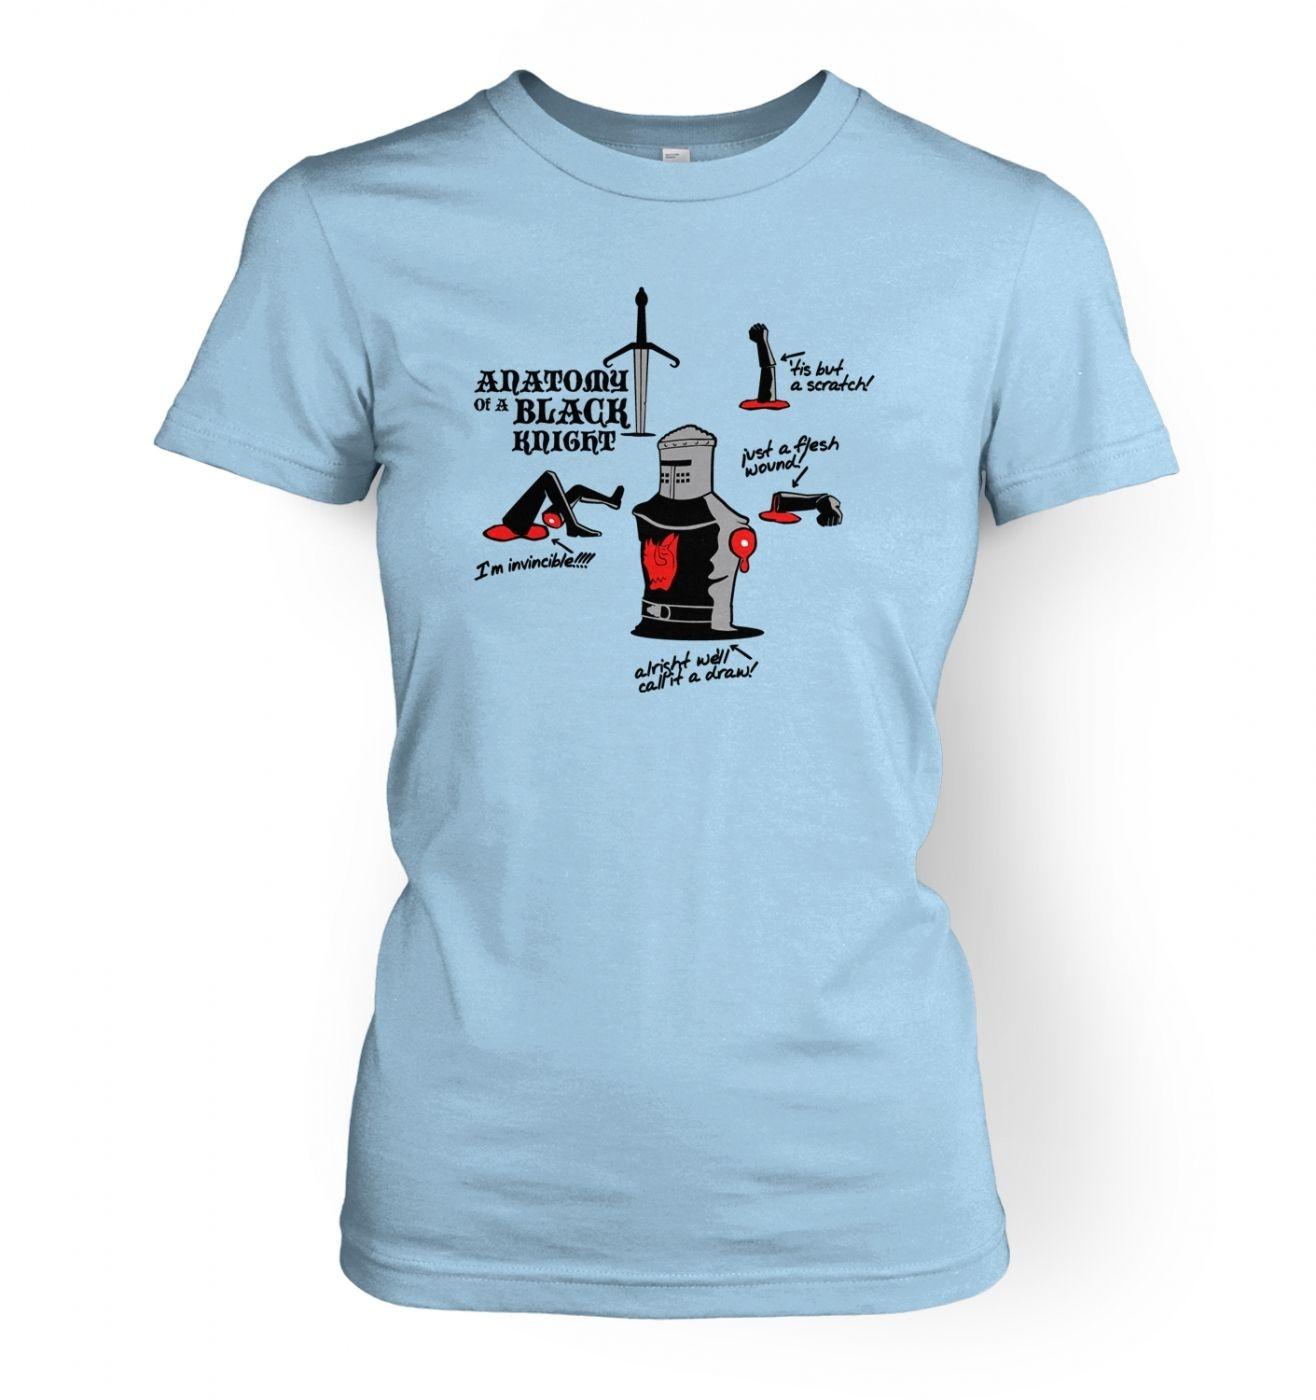 Anatomy of a Black Knight womens t-shirt - Somethinggeeky